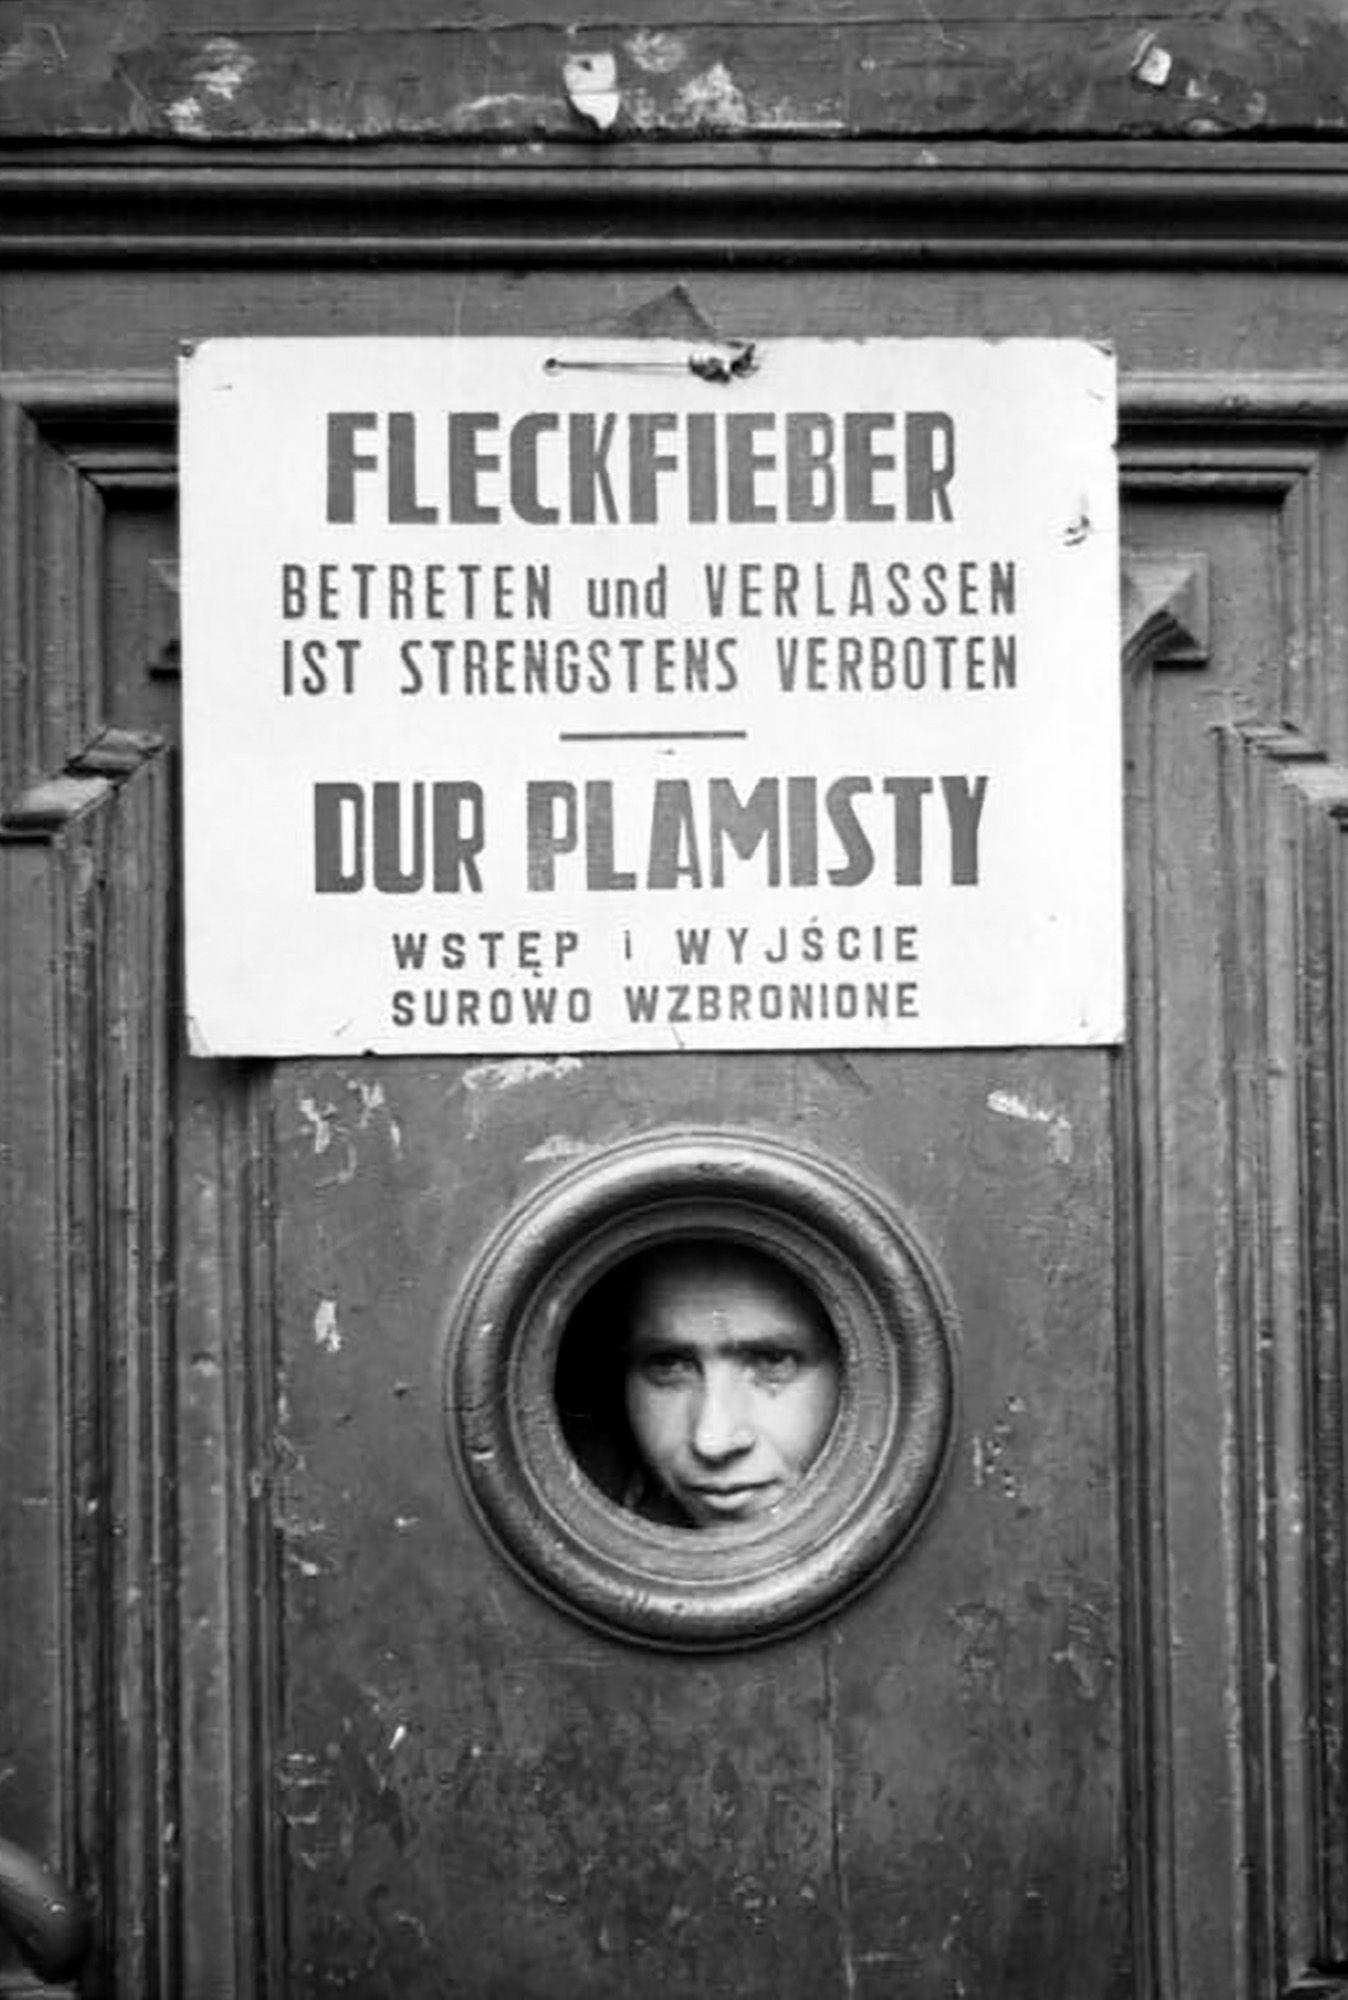 Polen, Ghetto Warschau, Fleckfieber-Warnung